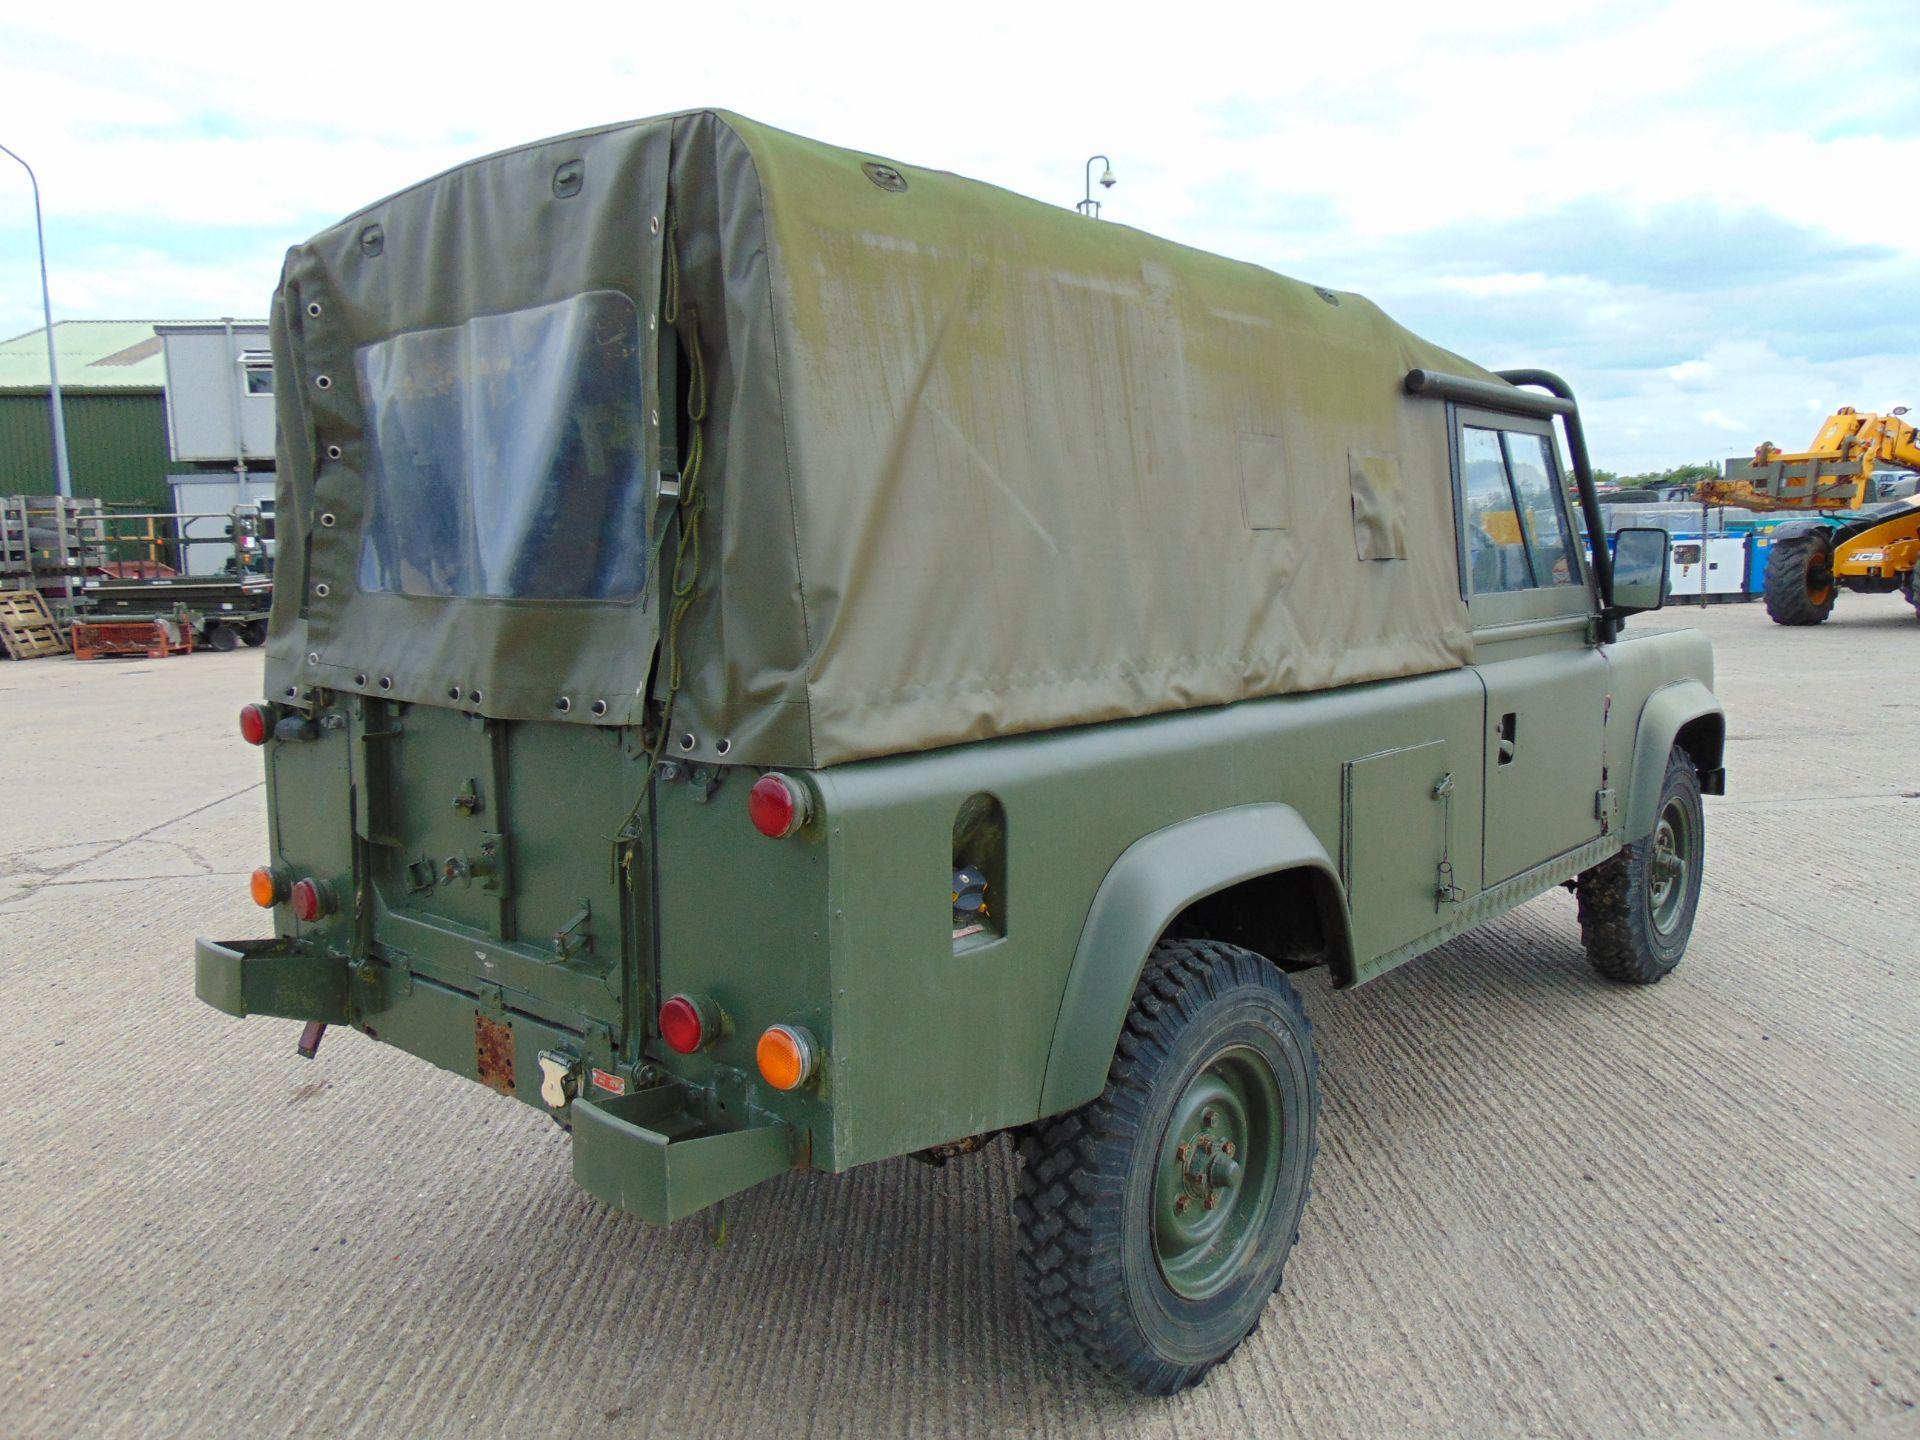 Lot 9 - Land Rover Defender TITHONUS 110 Soft Top